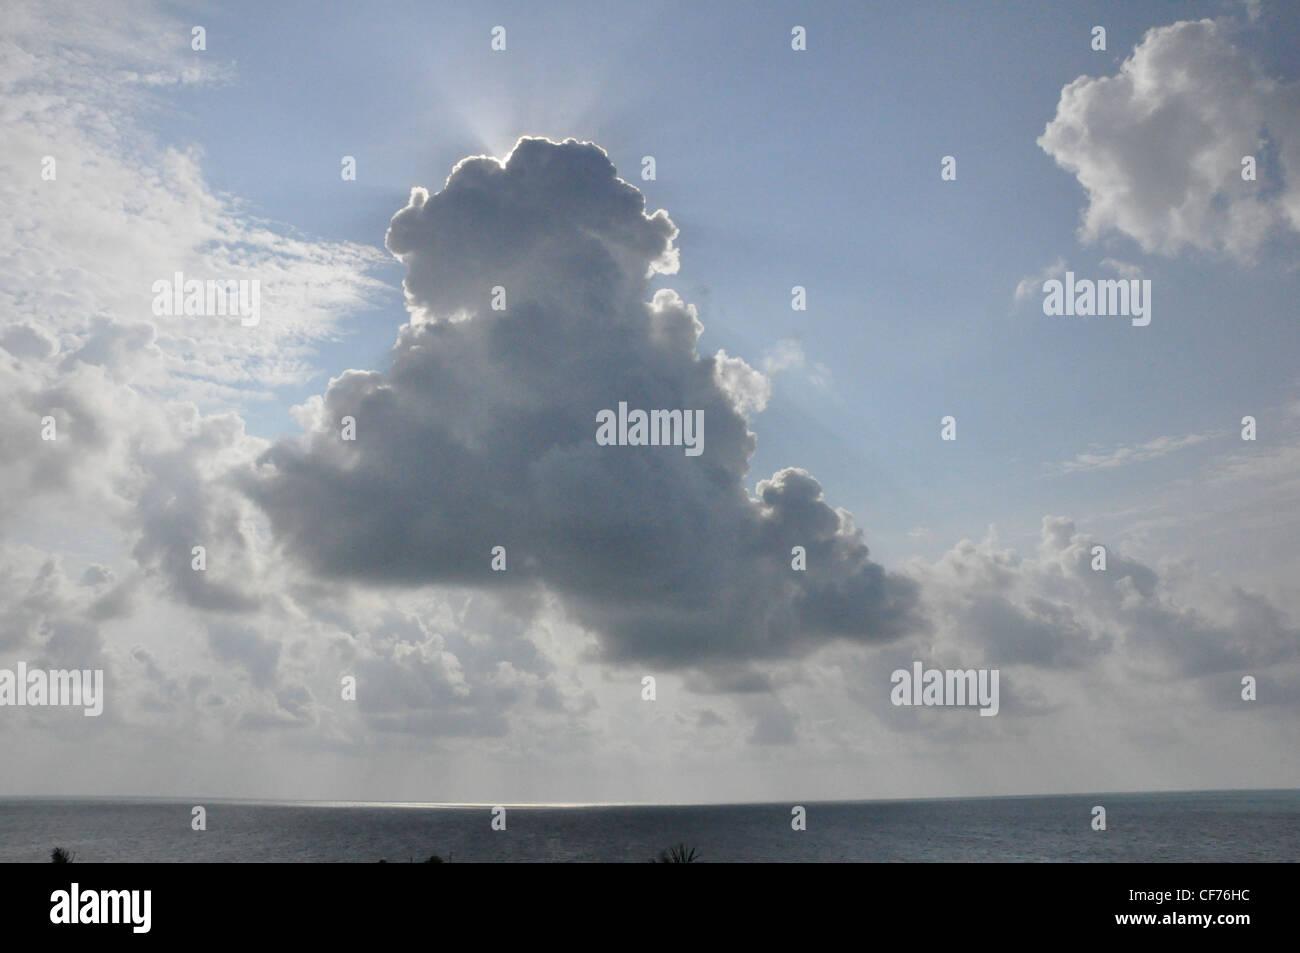 Summer sunshine and sunlit clouds optimistic pastels - Stock Image